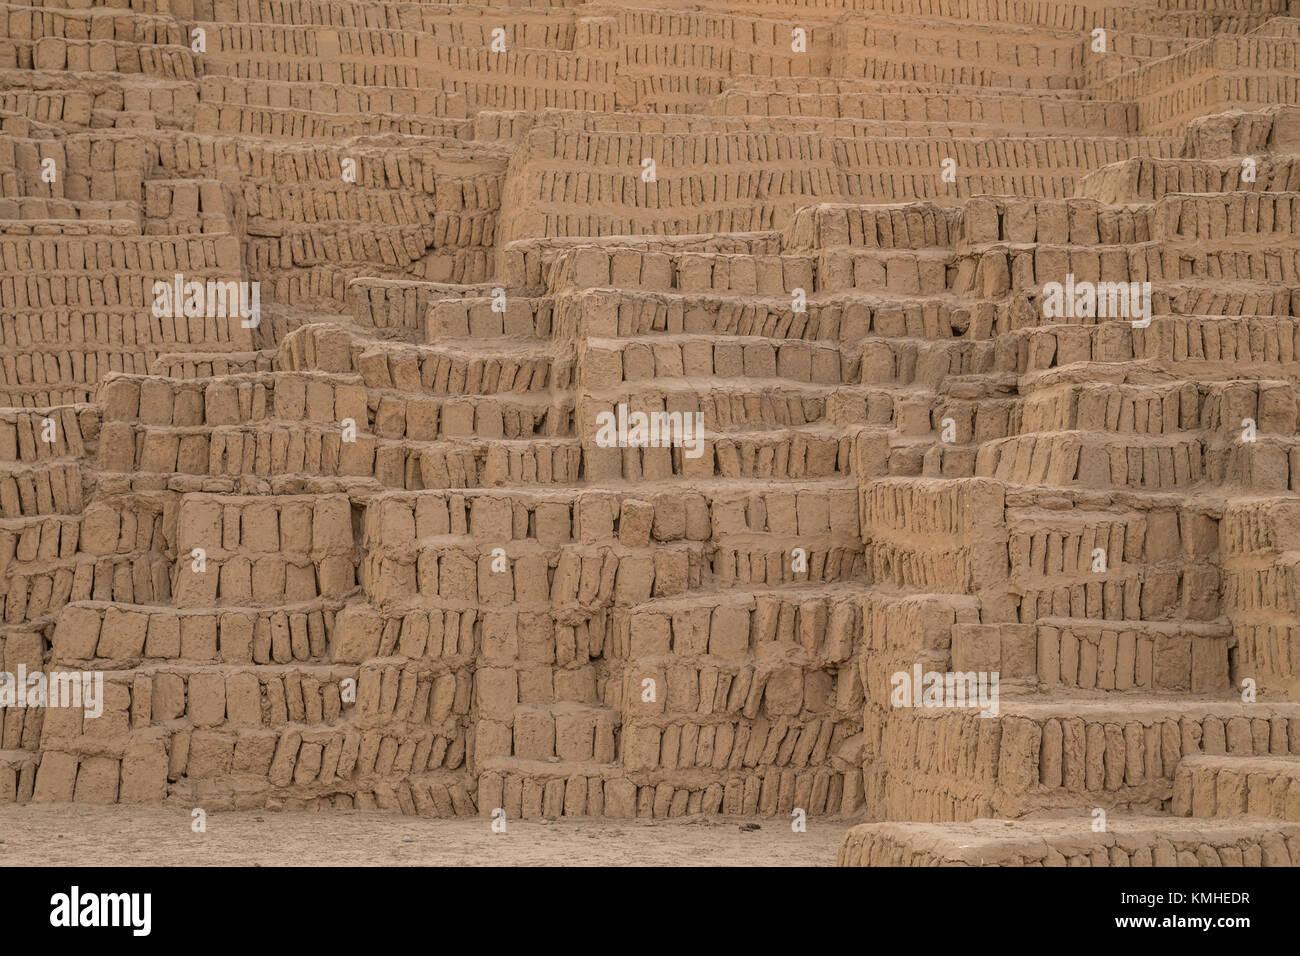 Huaca Pucllana or Huaca Juliana, a huge adobe and clay pyramid in the Miraflores district of central Lima, Peru, - Stock Image